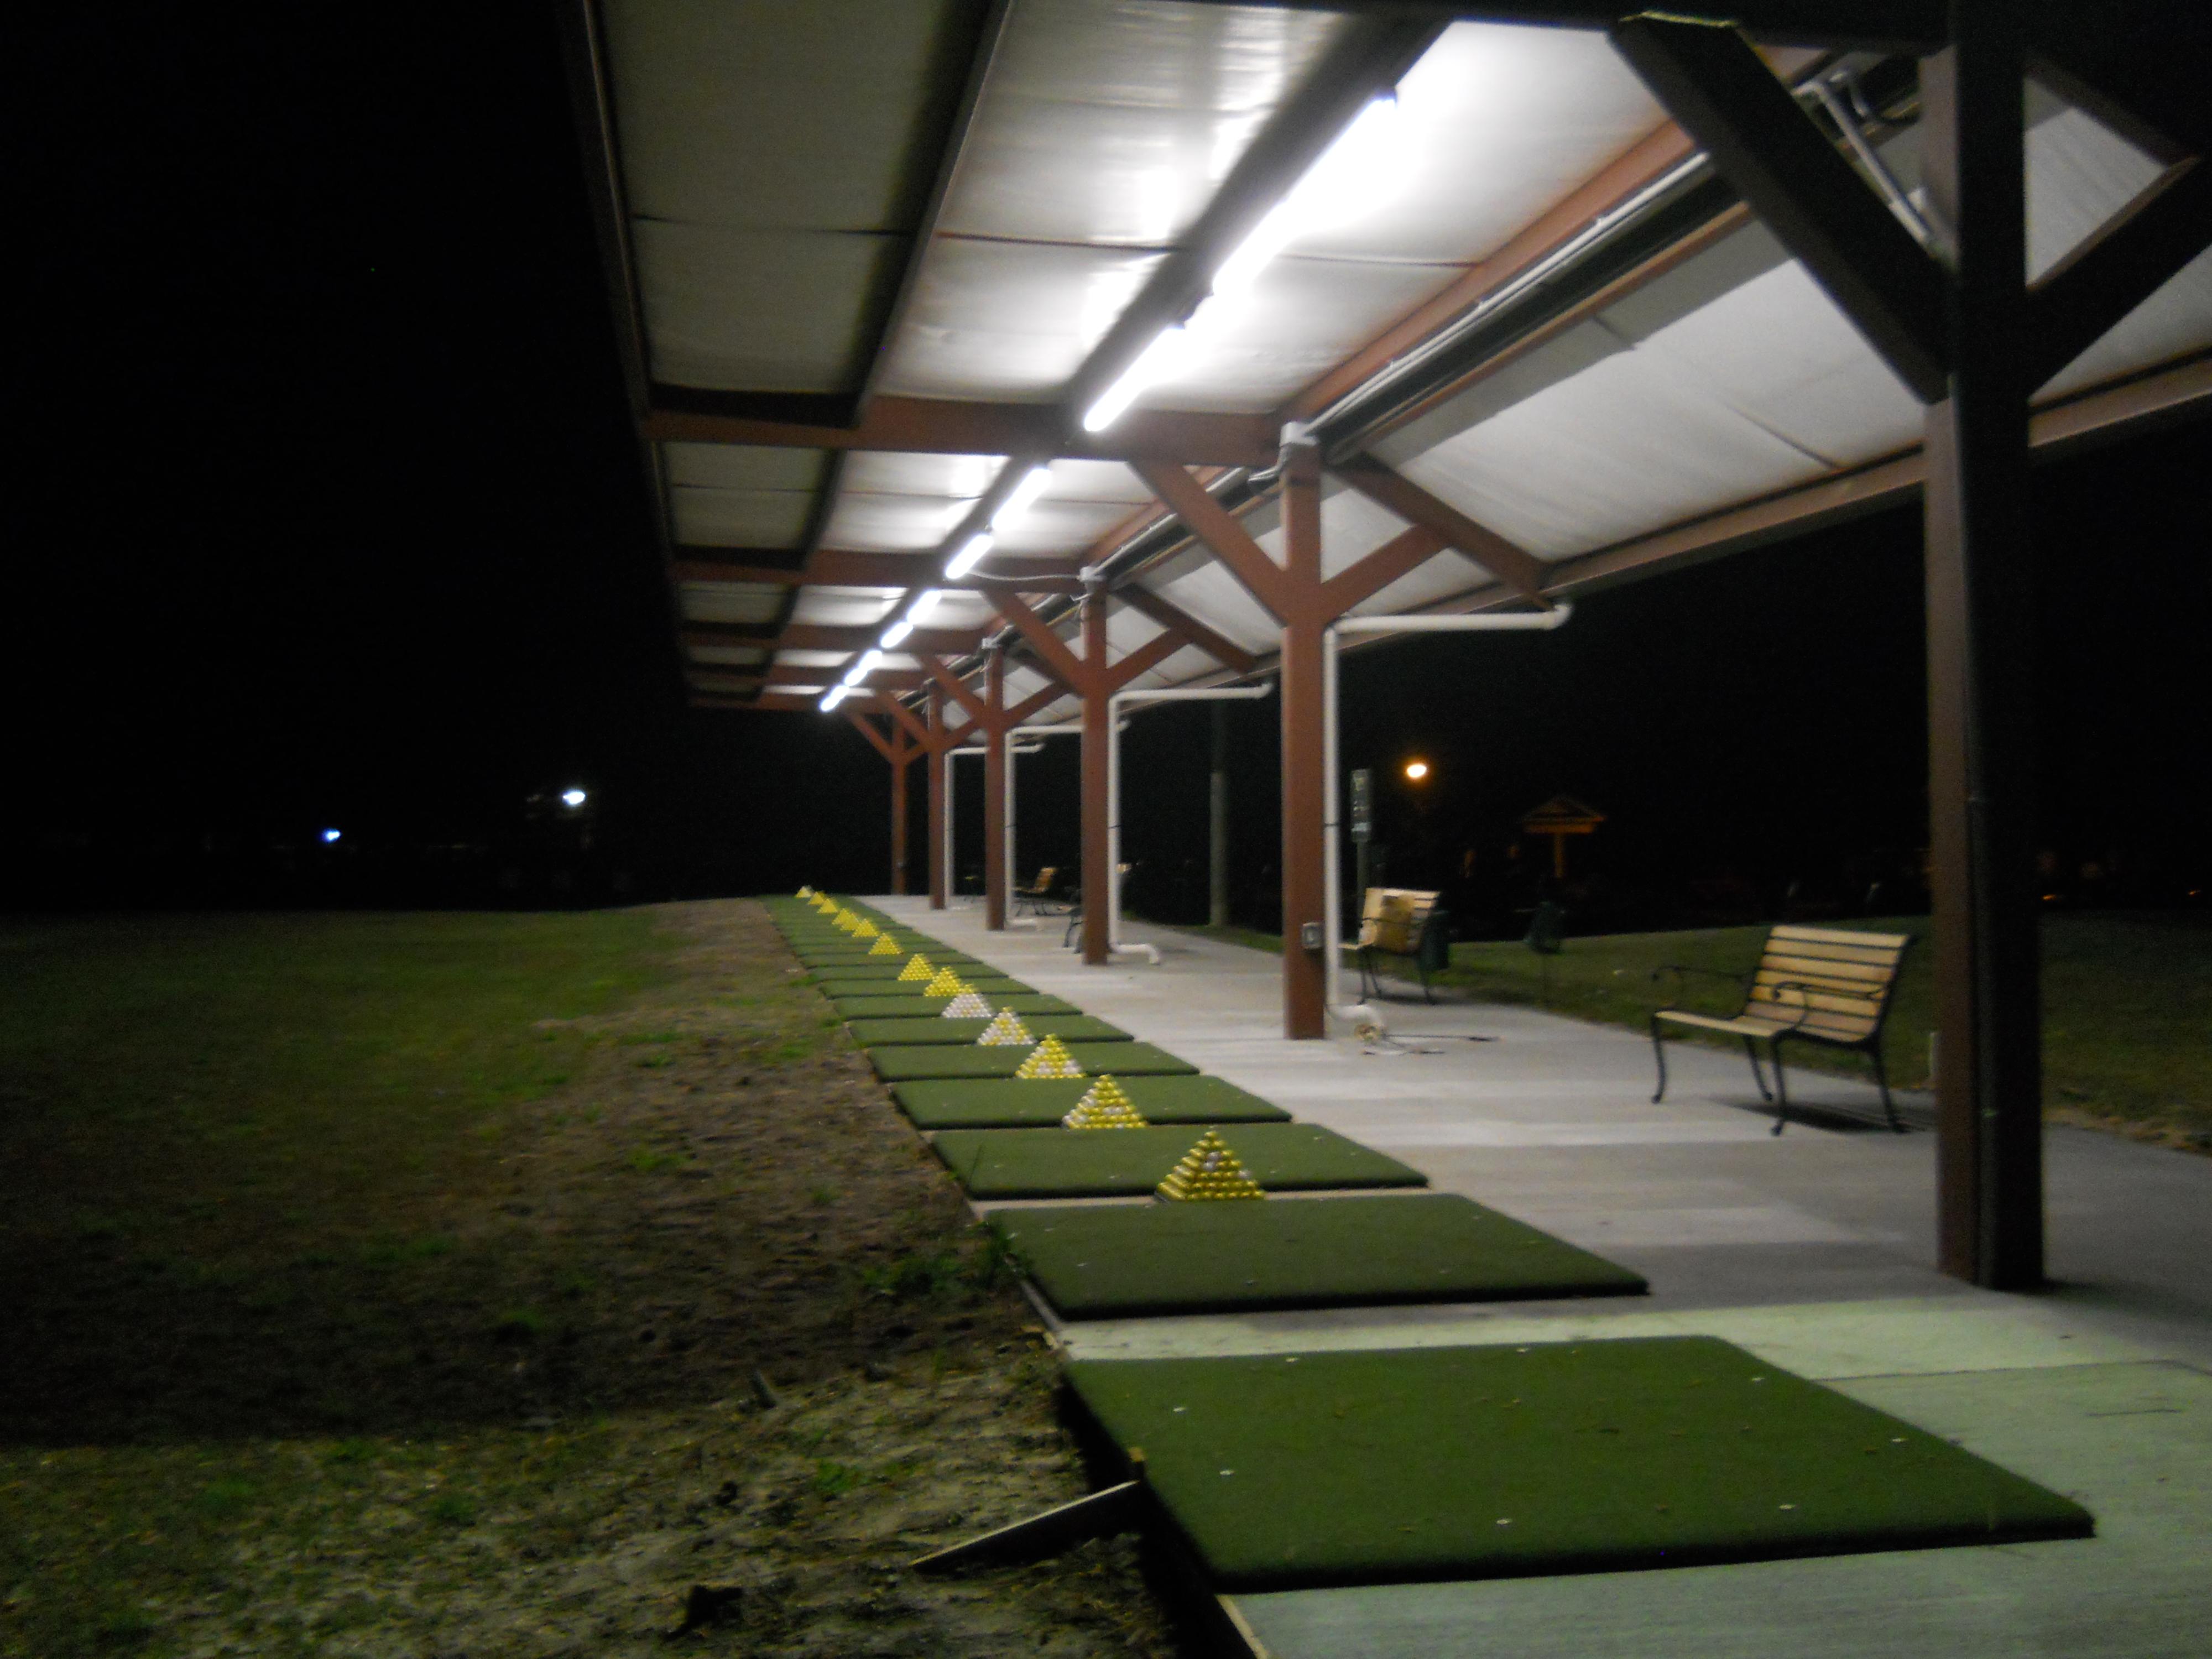 Governor's Run Golf Club